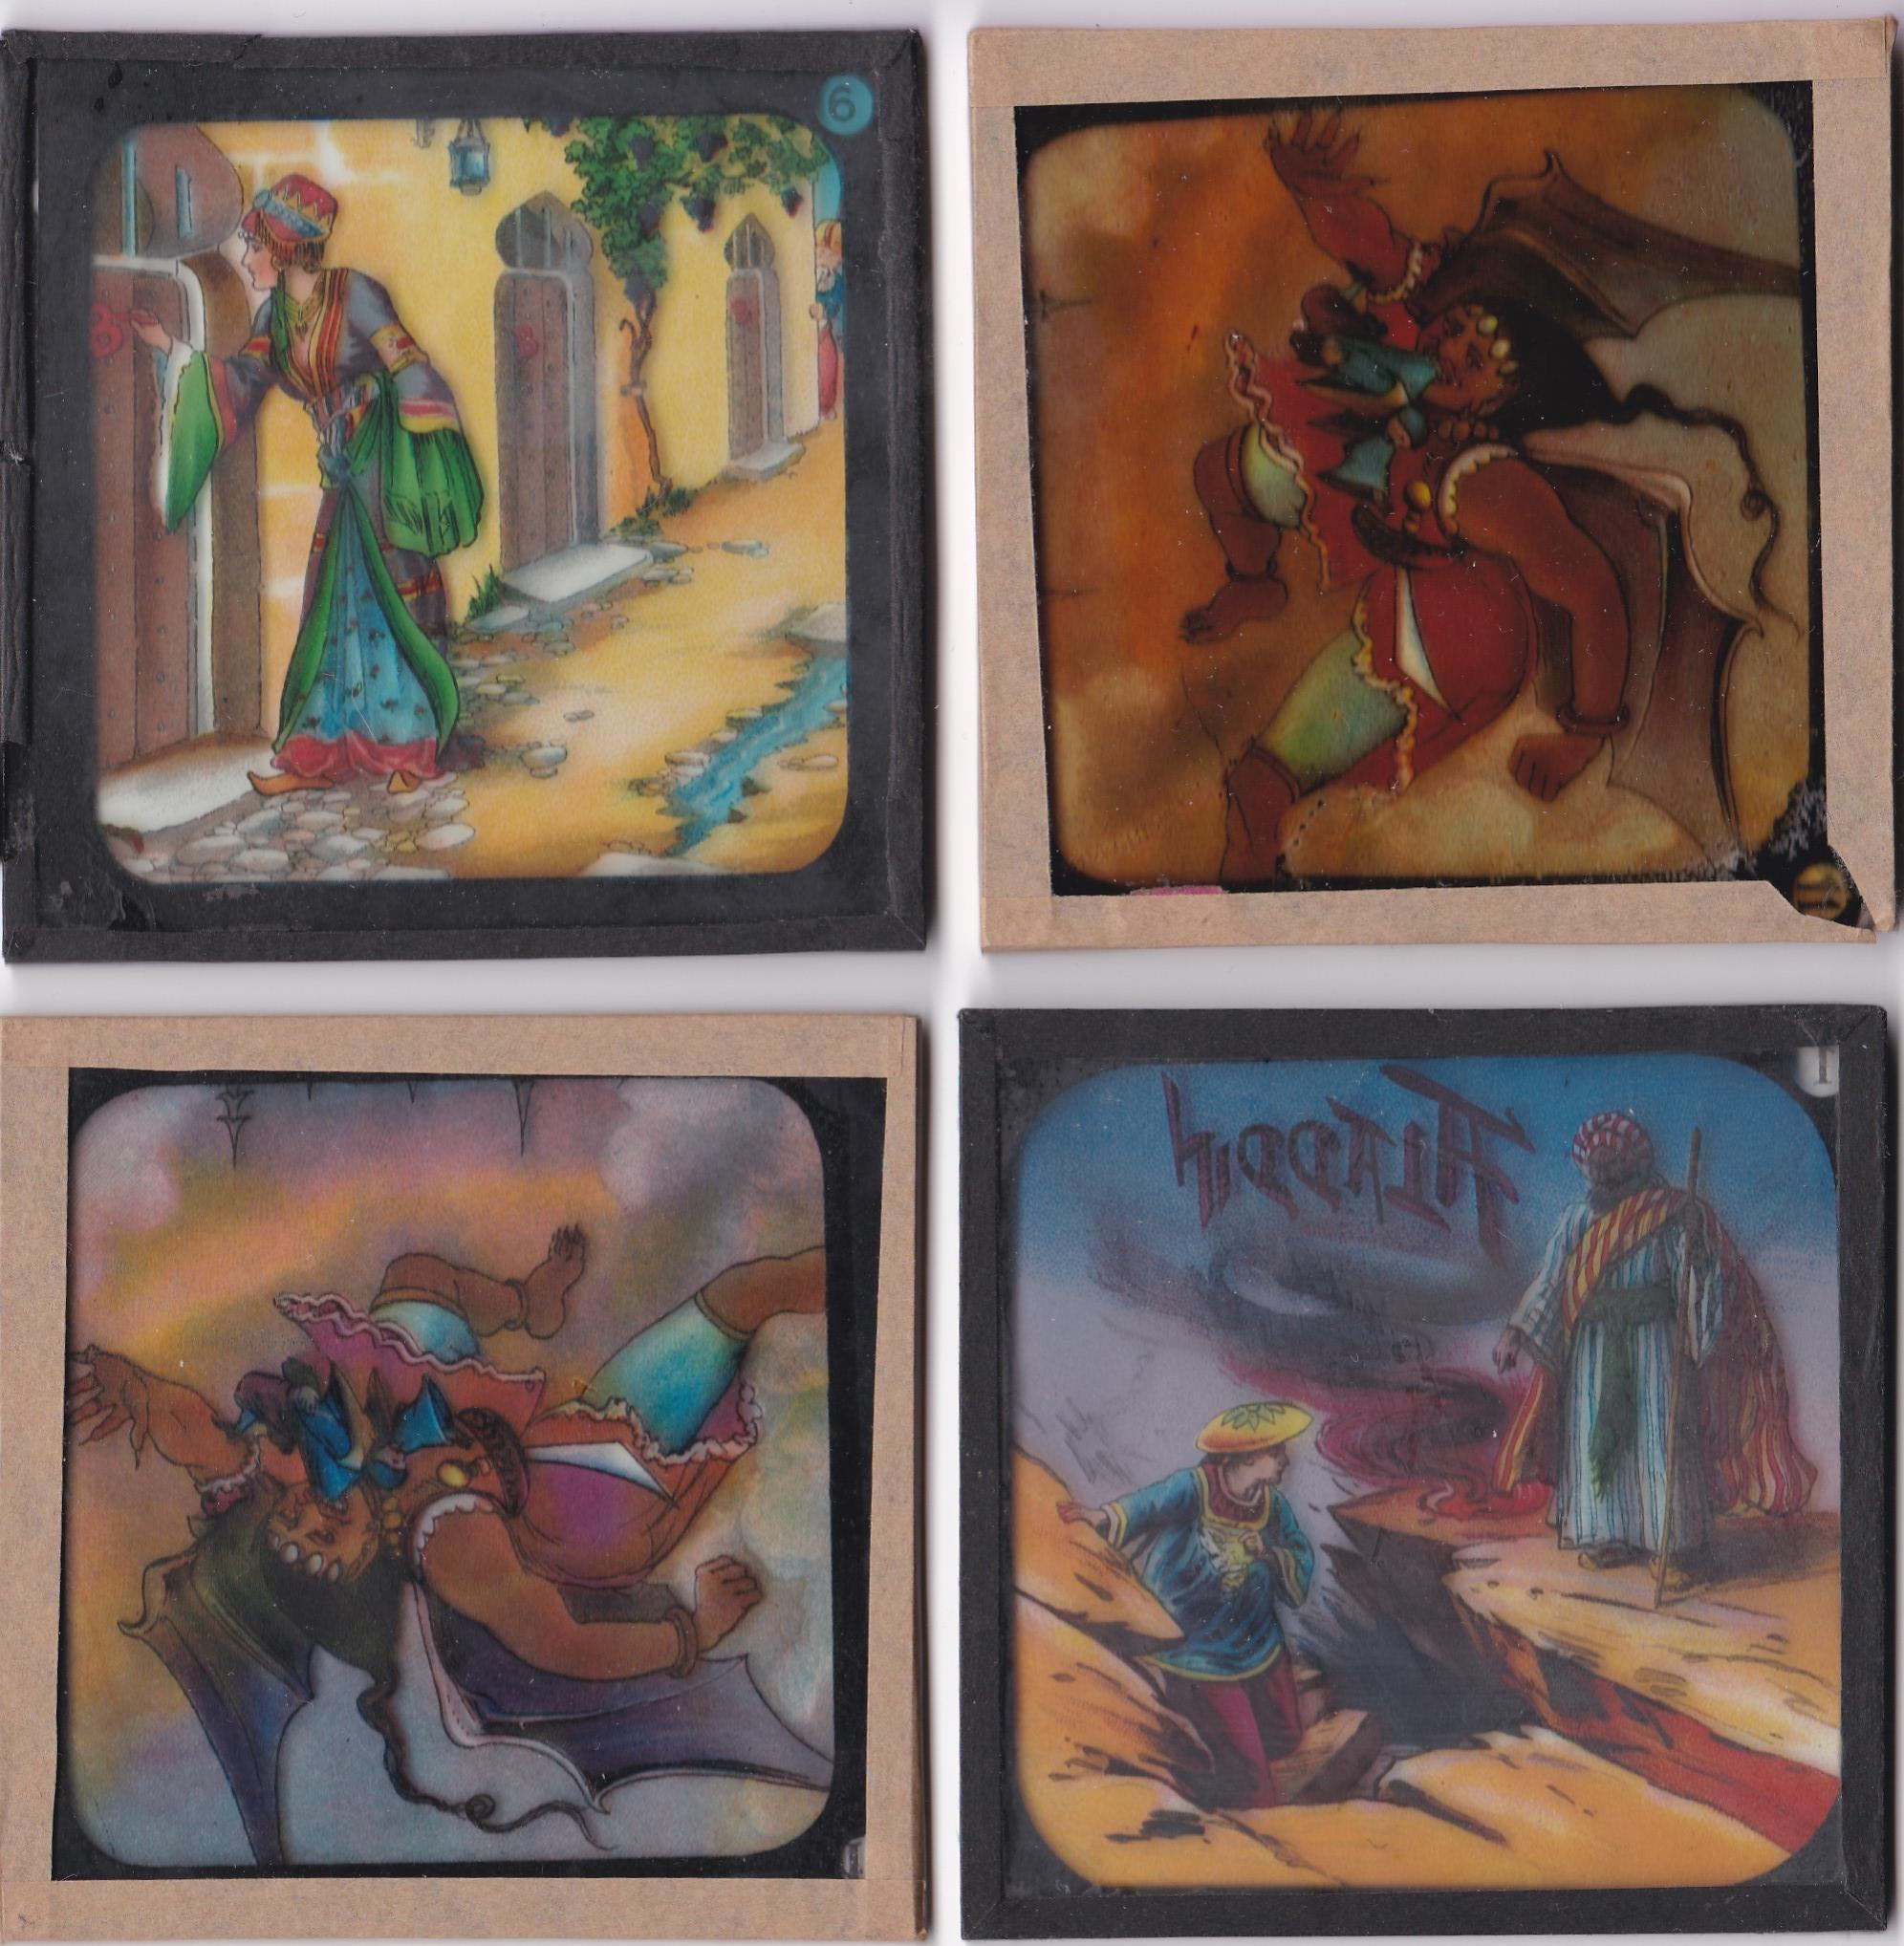 Aladdin Magic Lantern Coloured Lantern Slides (Complete set of 8 with two extra slides) Aladdin is - Image 2 of 2